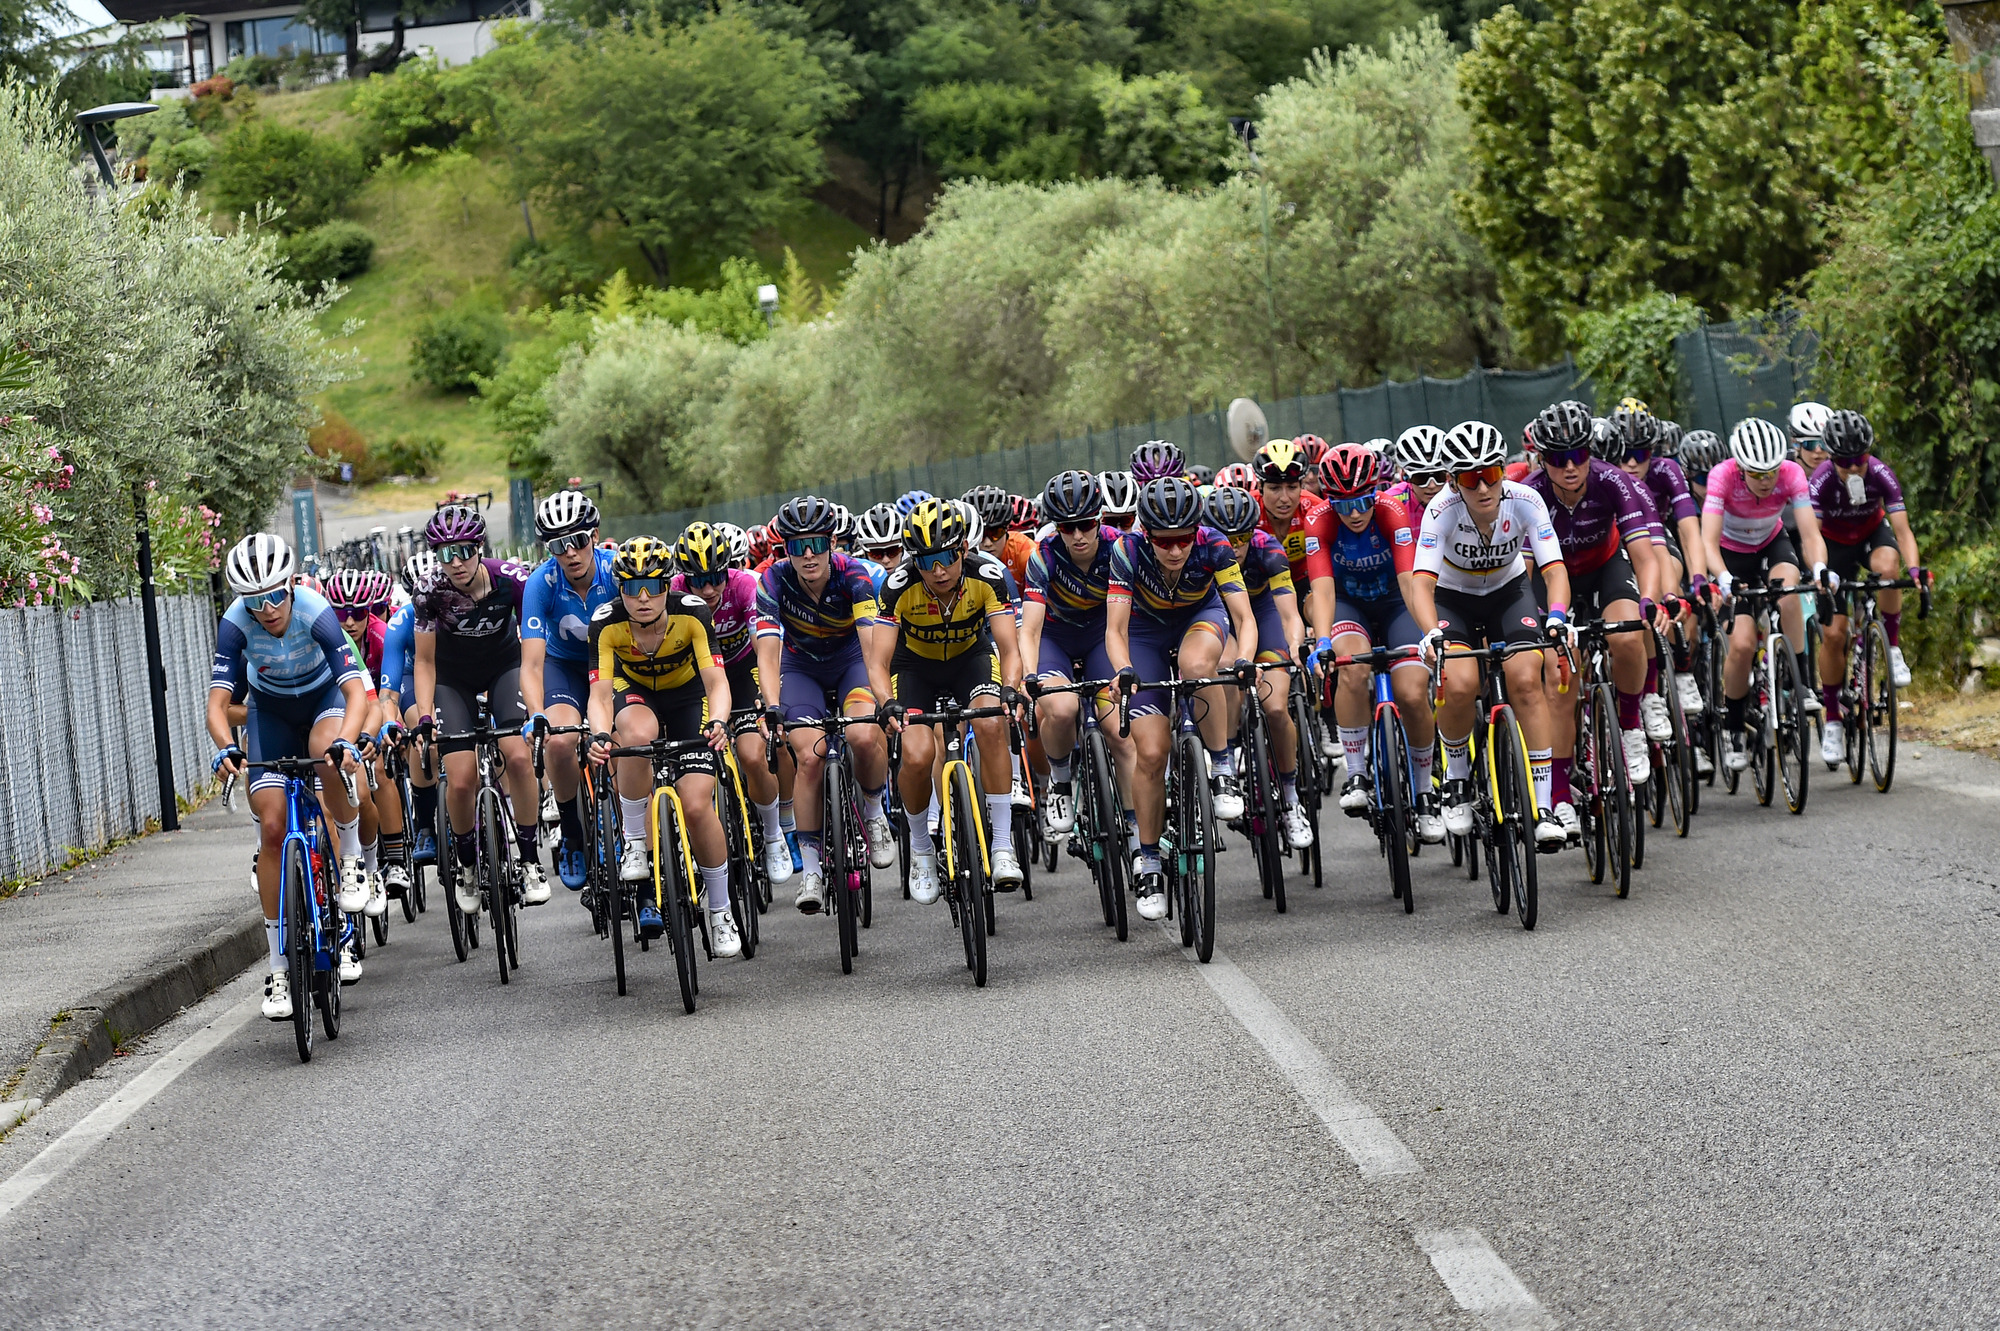 https://www.giroditaliadonne.it/2021/07/08/seventh-stage-of-giro-ditalia-donne-2021-soprazocco-di-gavardo-puegnago-del-garda/